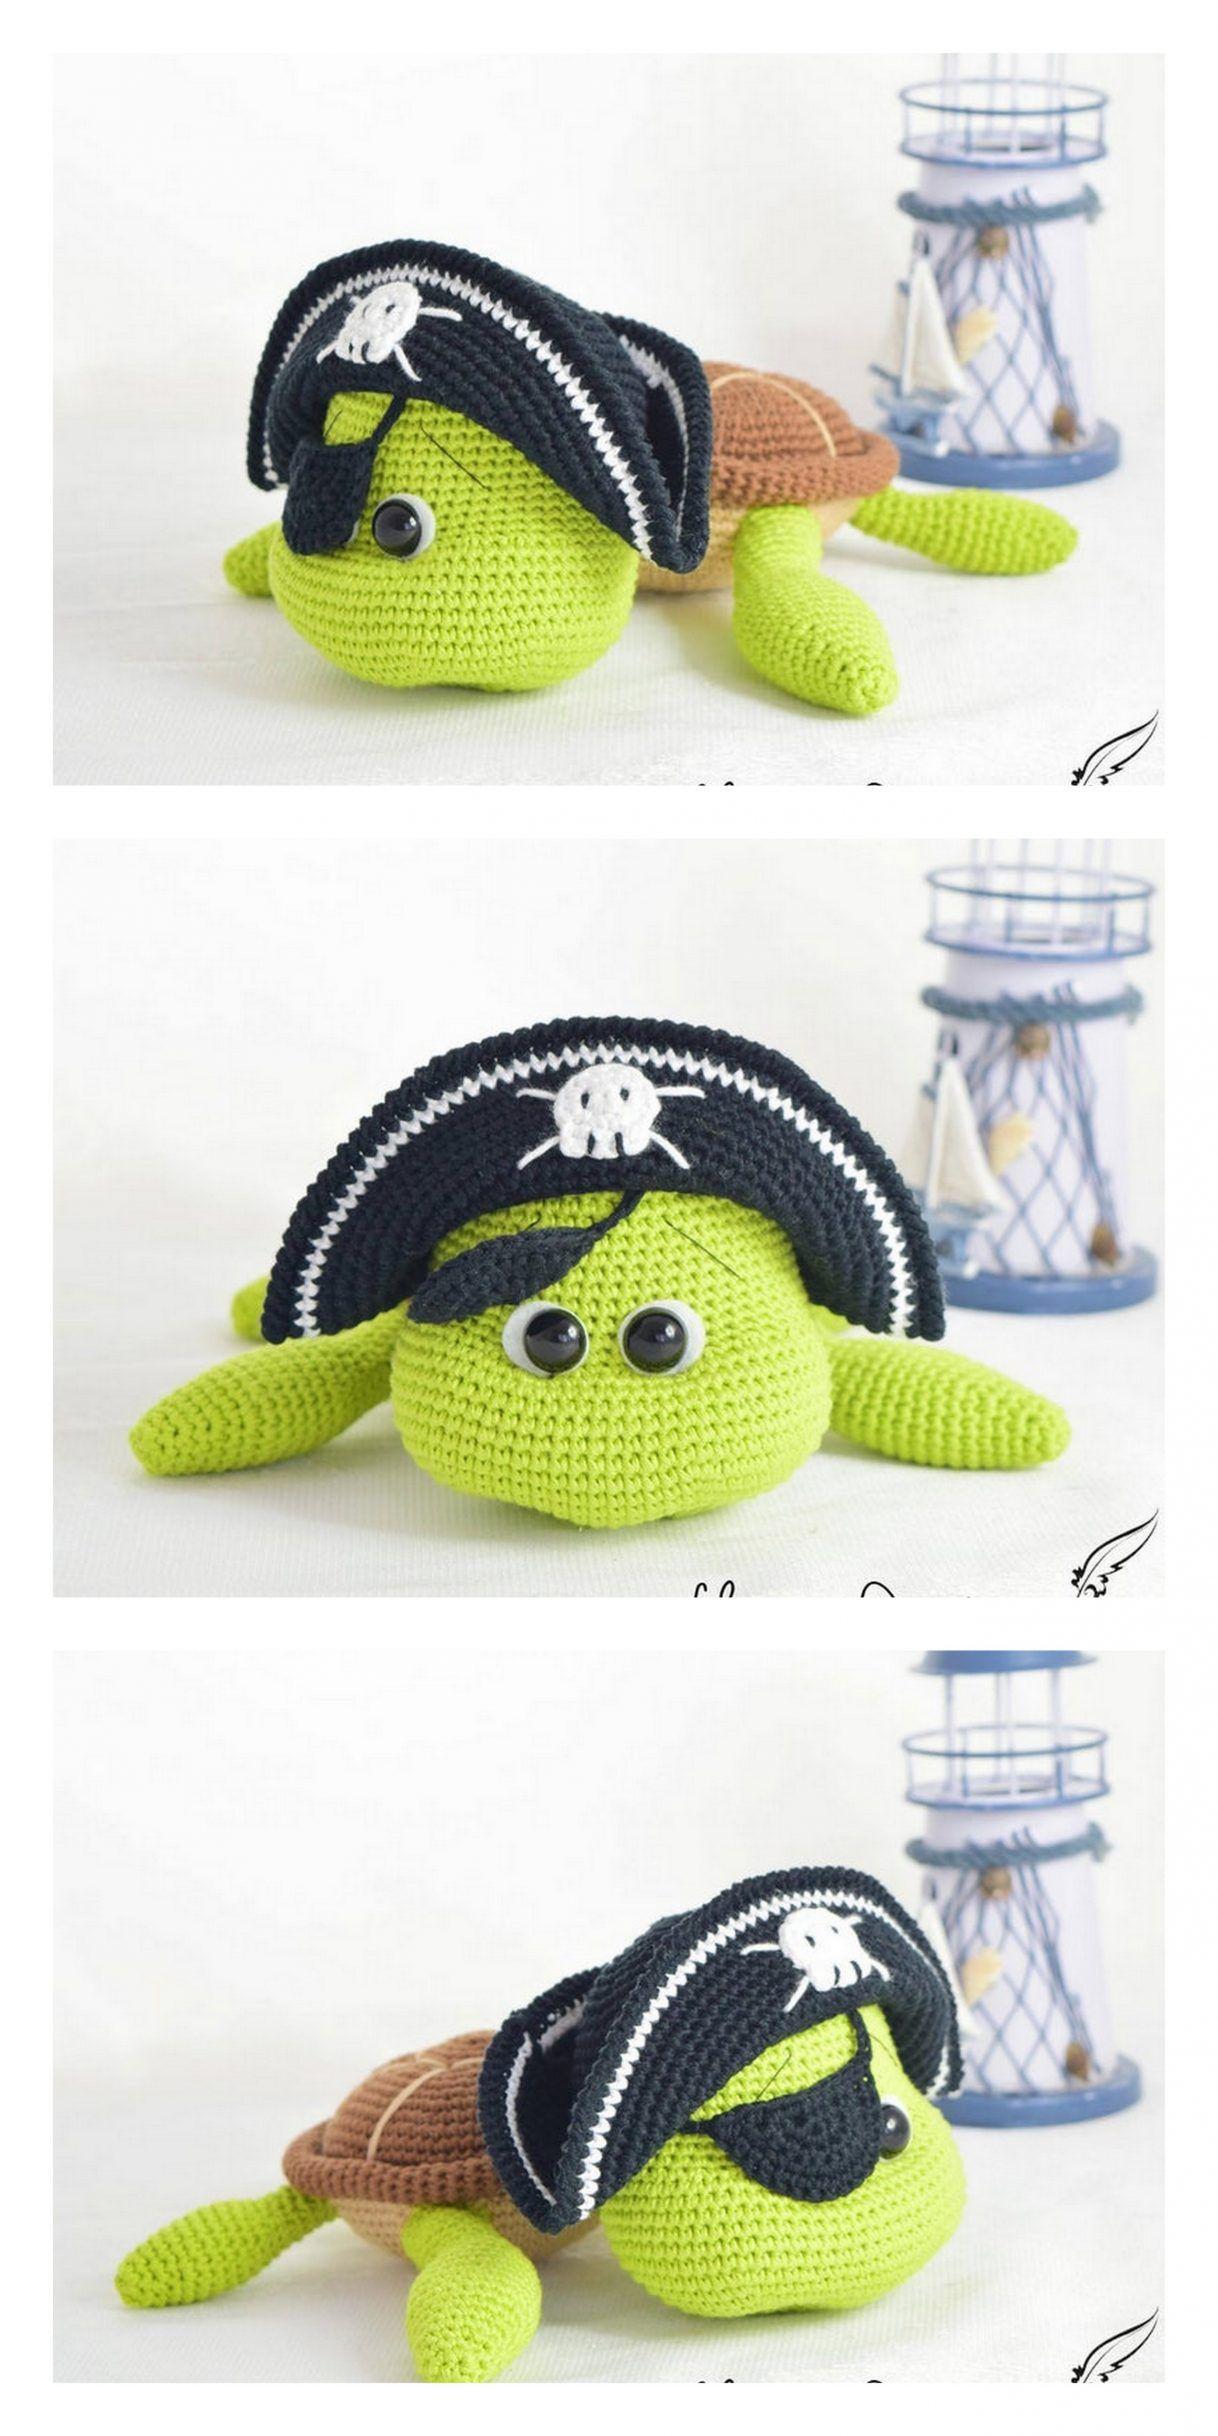 Amigurumi Cute Turtle Free Pattern – Free Amigurumi Patterns – Crochet